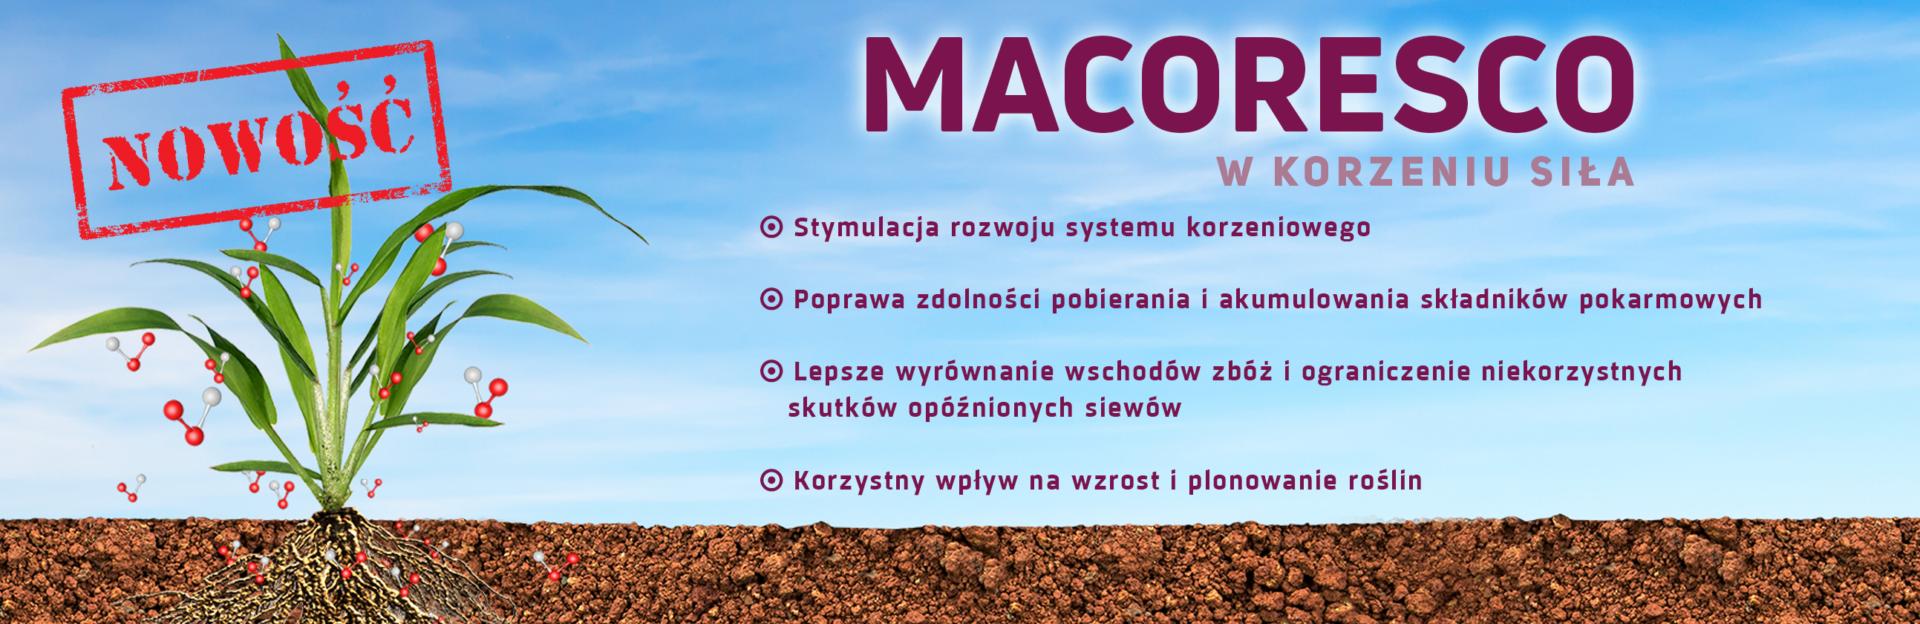 maco_baner_big3_ok